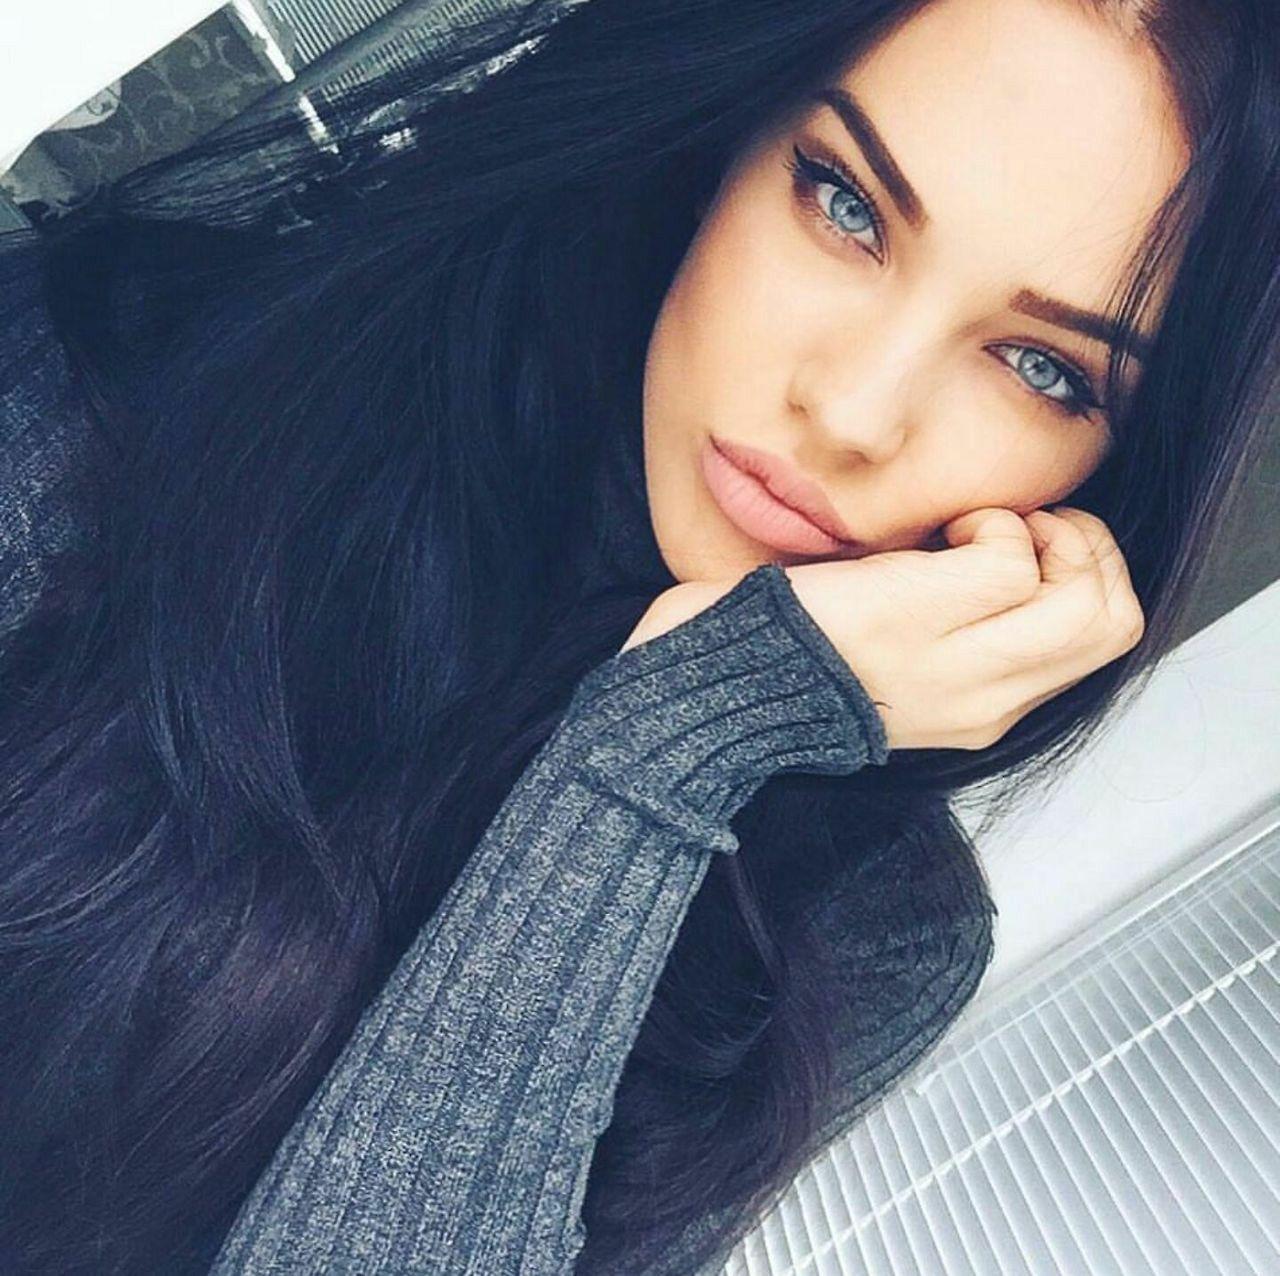 Pin By Lara On Eyesofbeauty Black Hair Blue Eyes Beauty Girl Hair Beauty